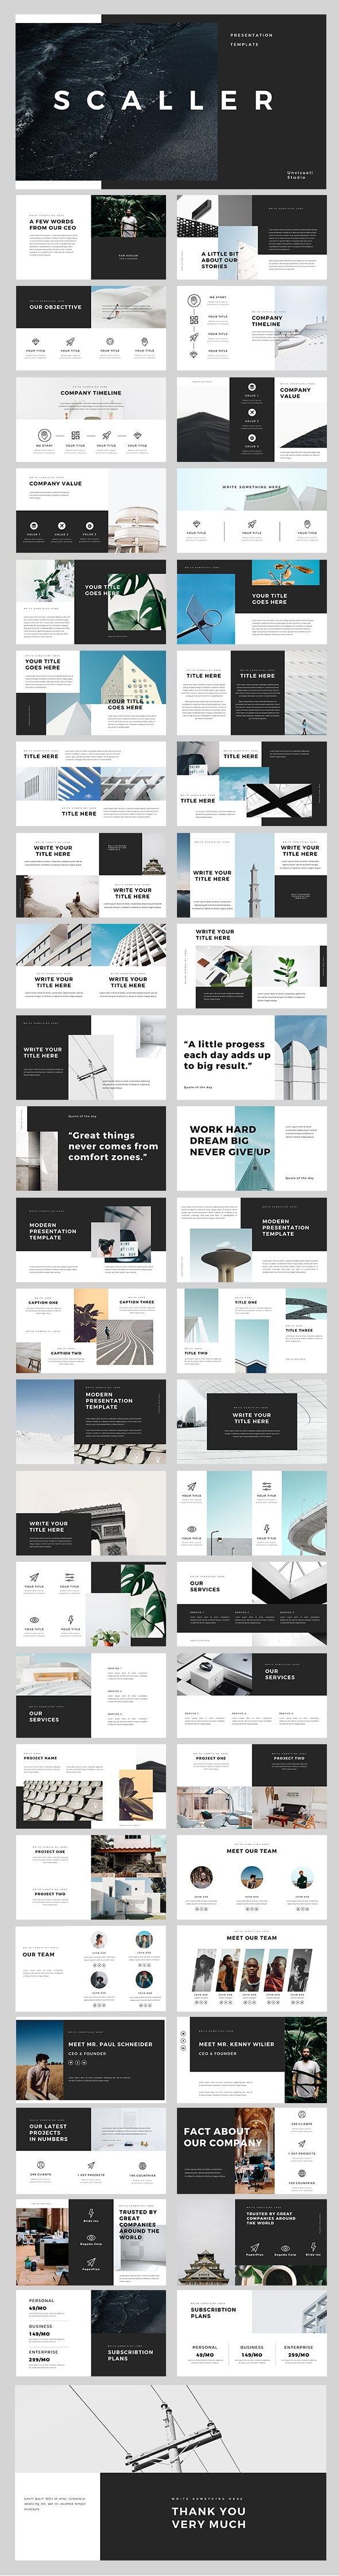 Scaller PowerPoint Template - Creative PowerPoint Templates